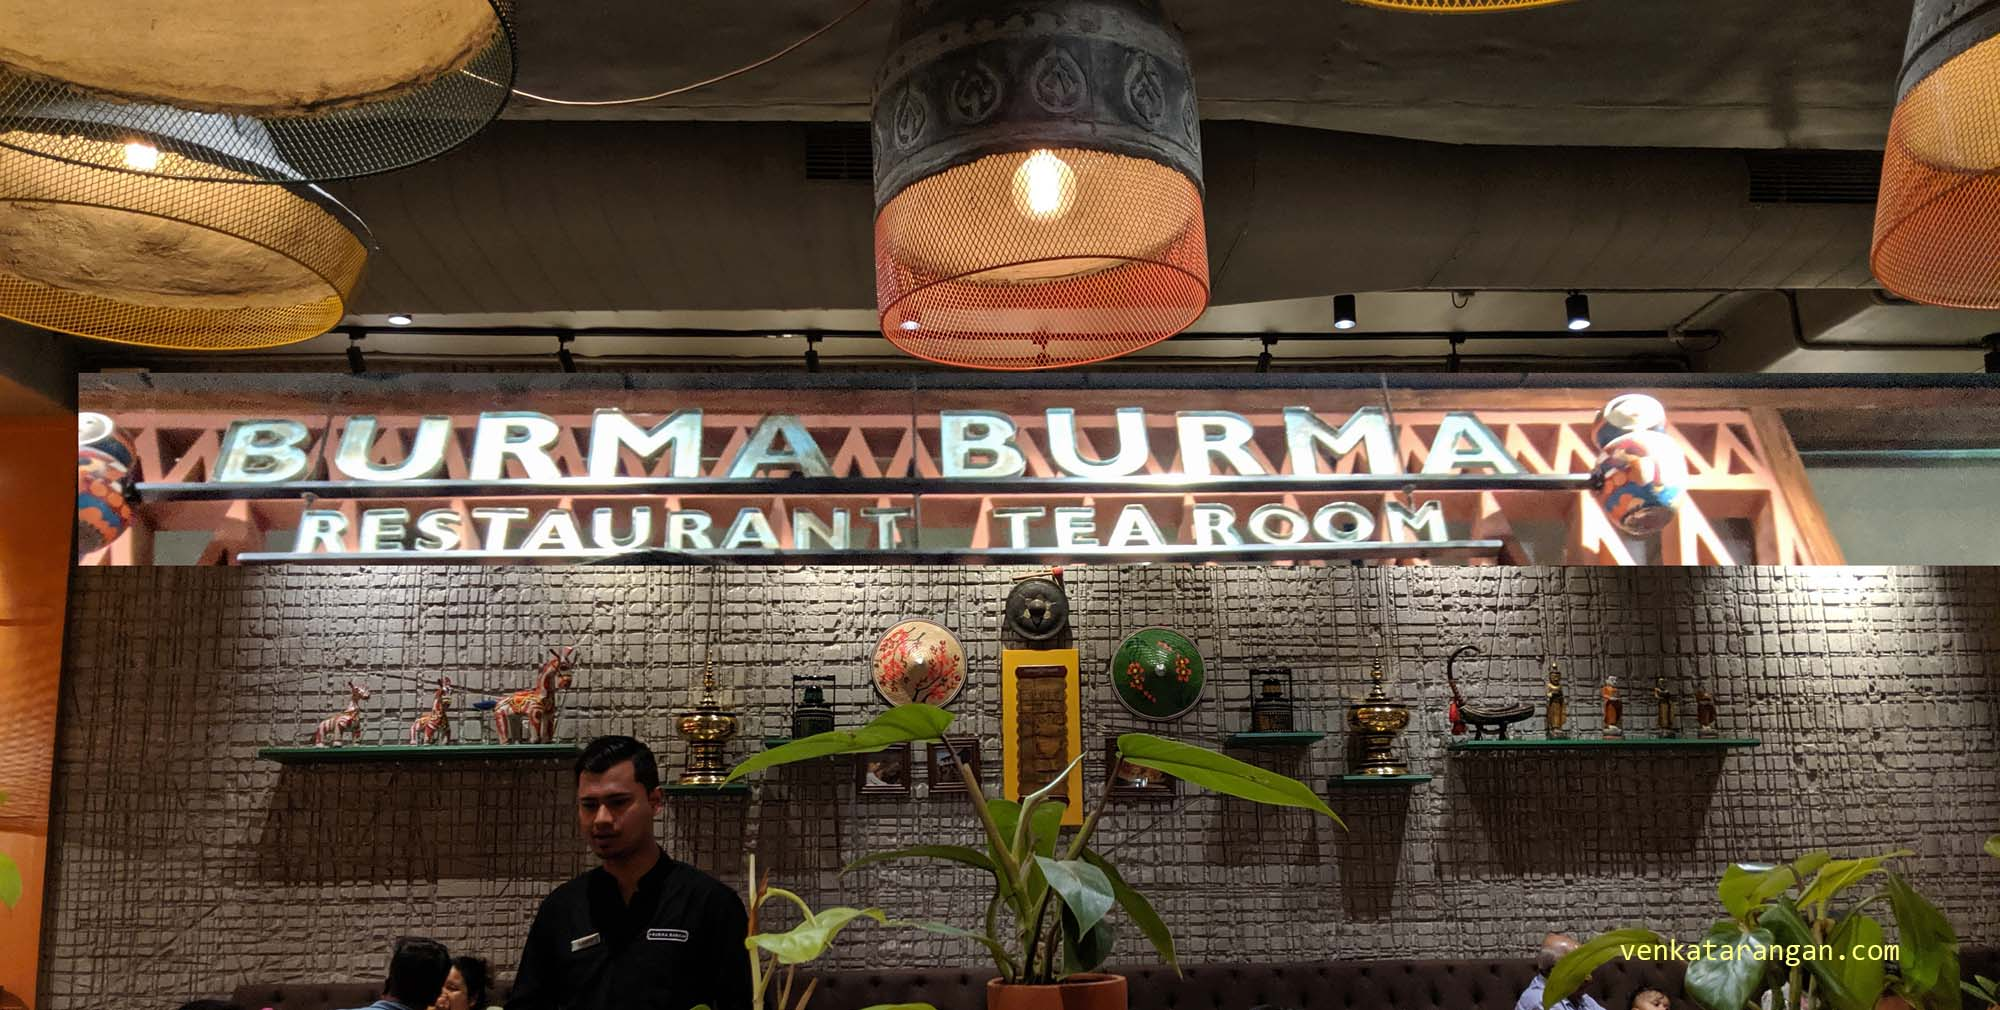 Burma Burma Restaurant, Indiranagar, Bengaluru